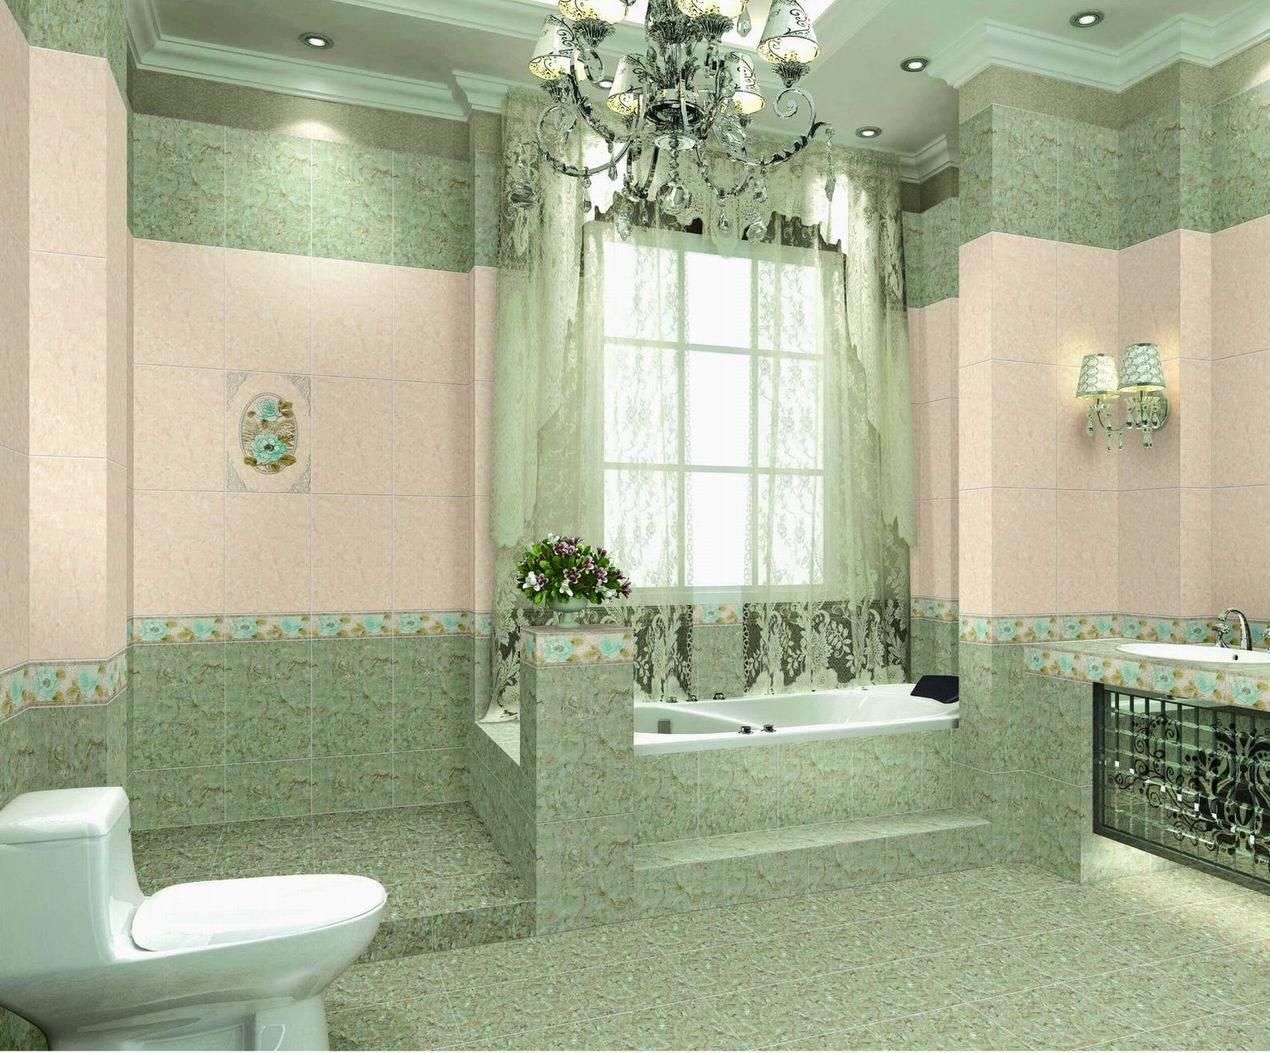 BATHROOM TILES PRICES BATHROOM TILE